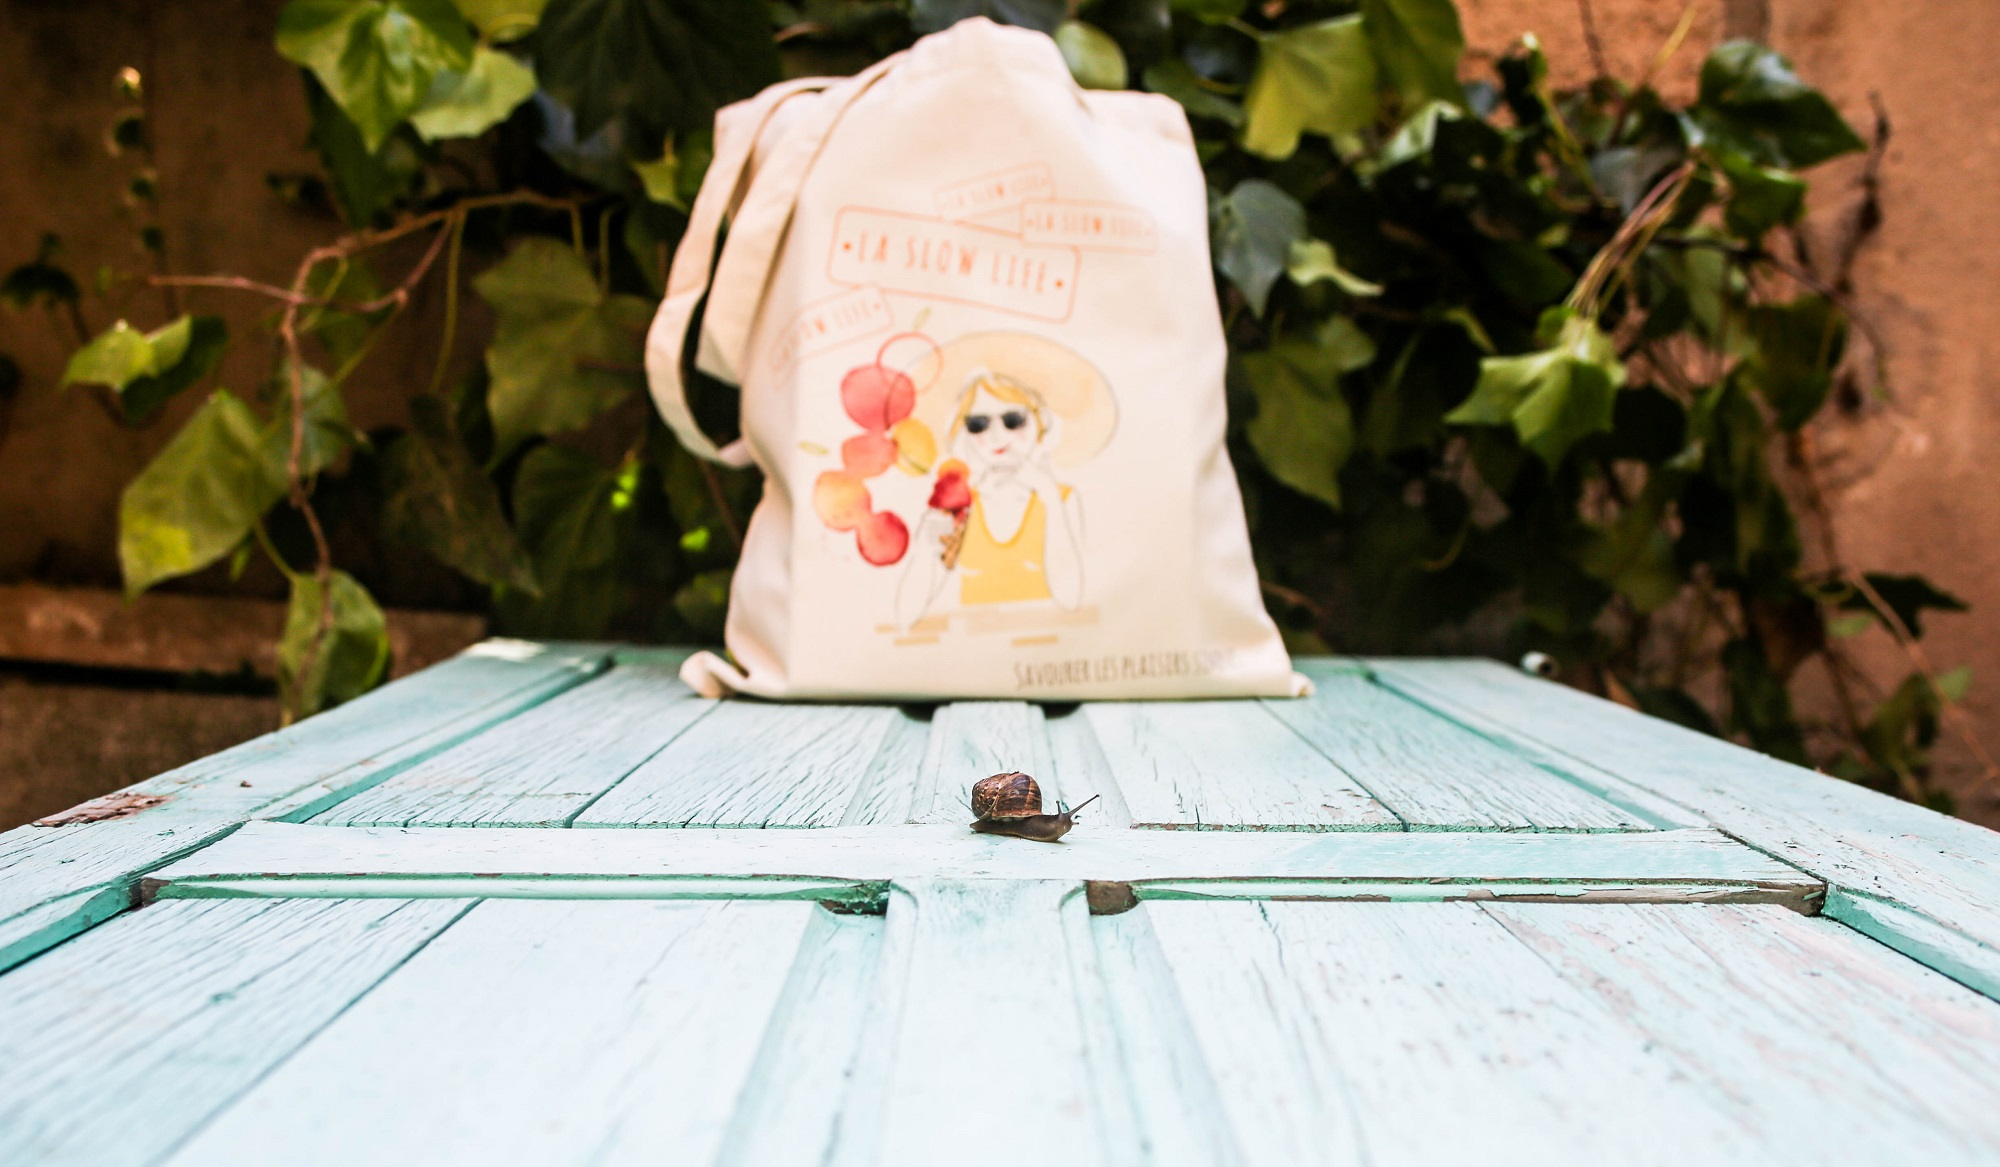 LA SLOW LIFE_SLOW BAG GOURMAND (3)